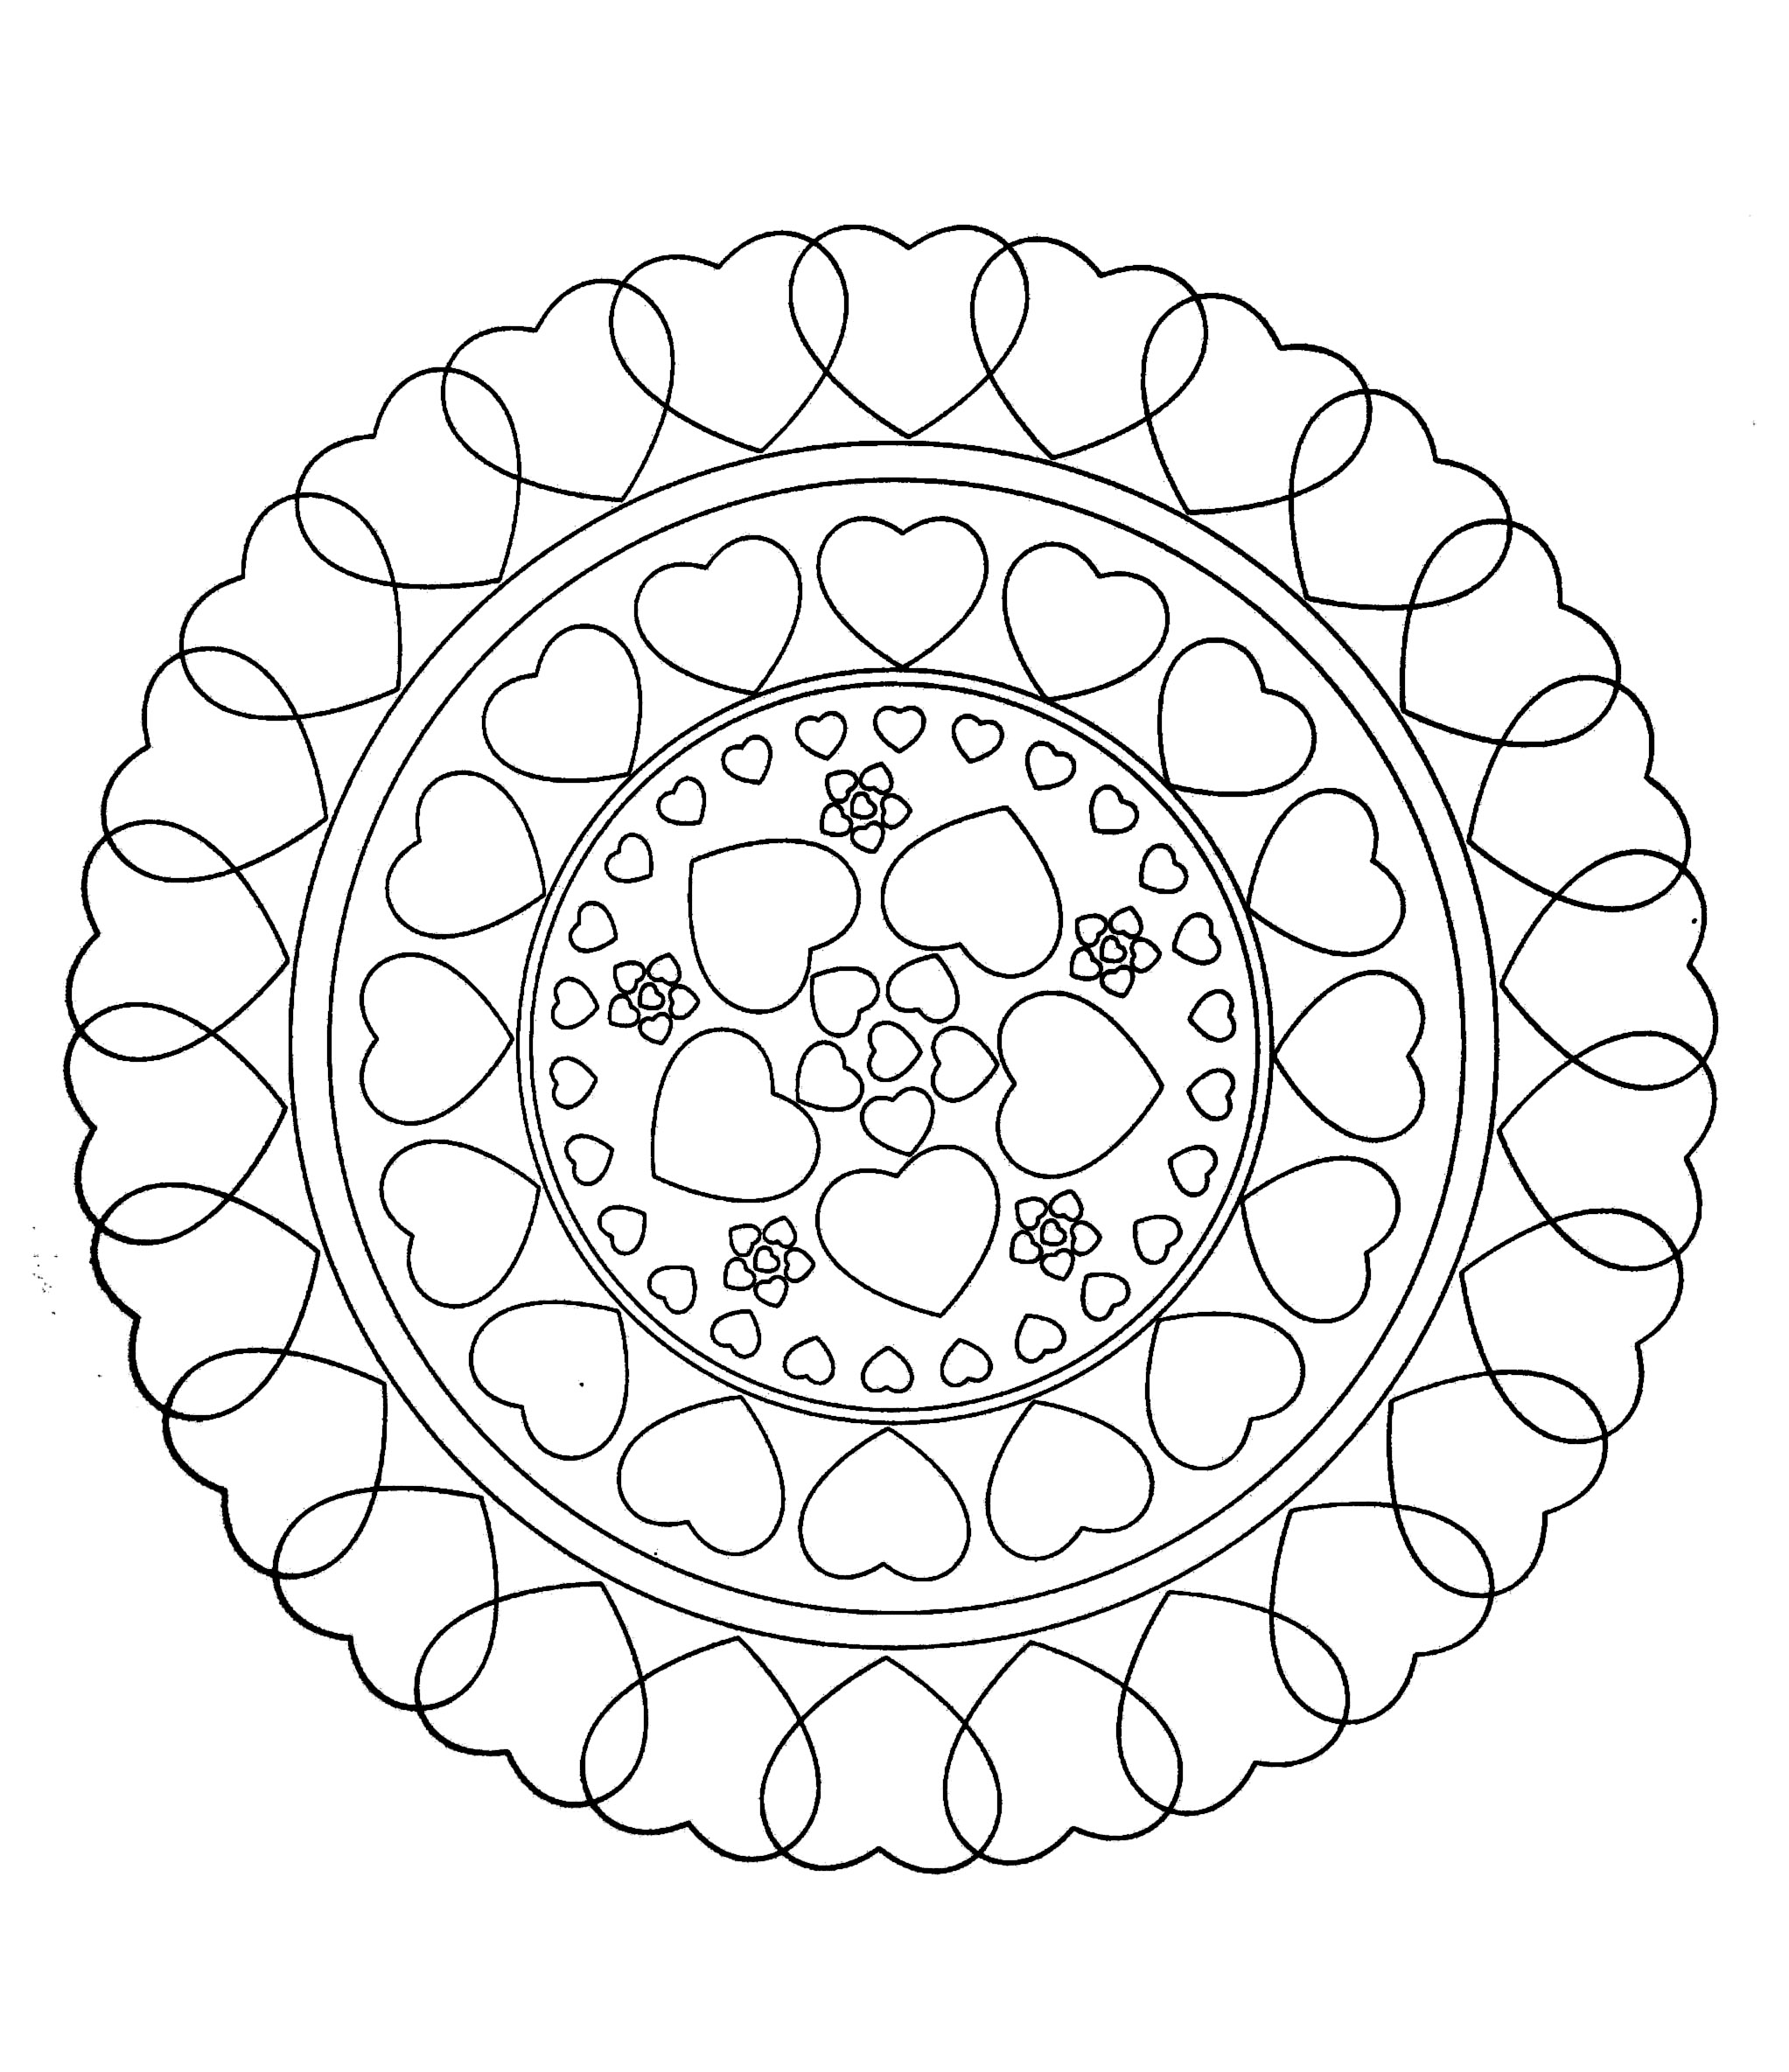 Coloriages de Mandalas : Coeur - 100% Mandalas Zen & Anti-stress